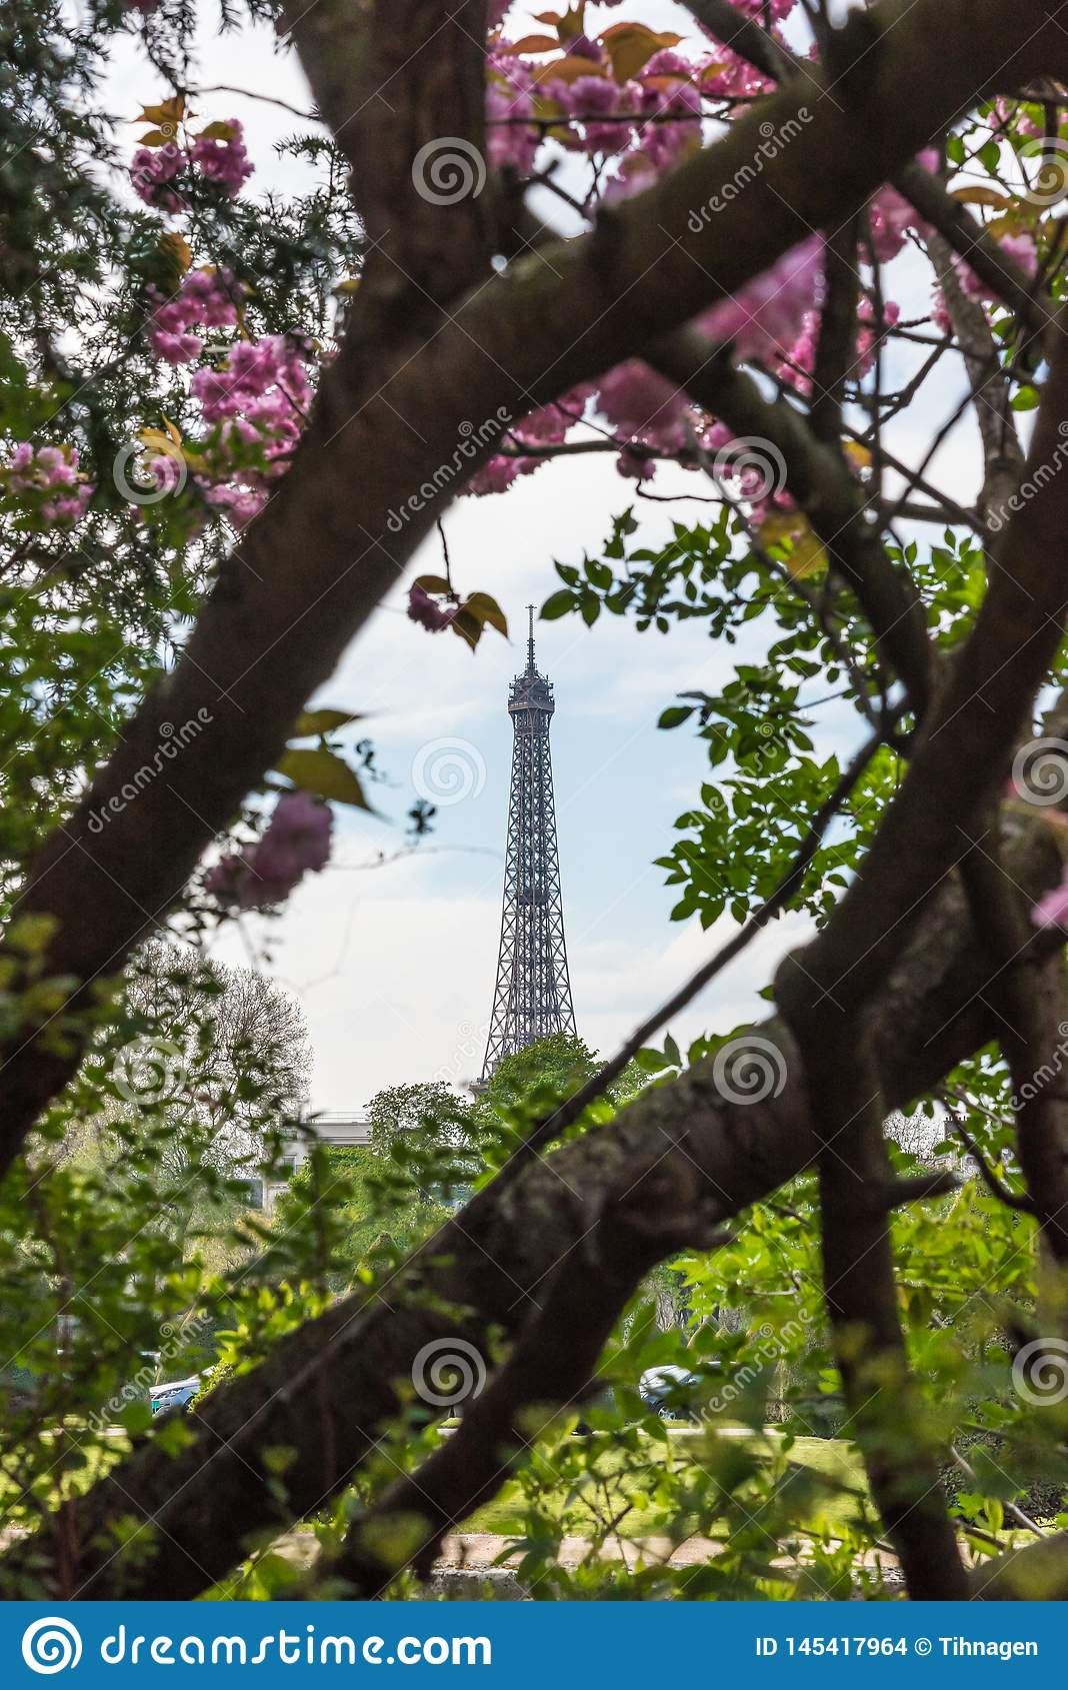 Excurs?o Eiffel, Paris